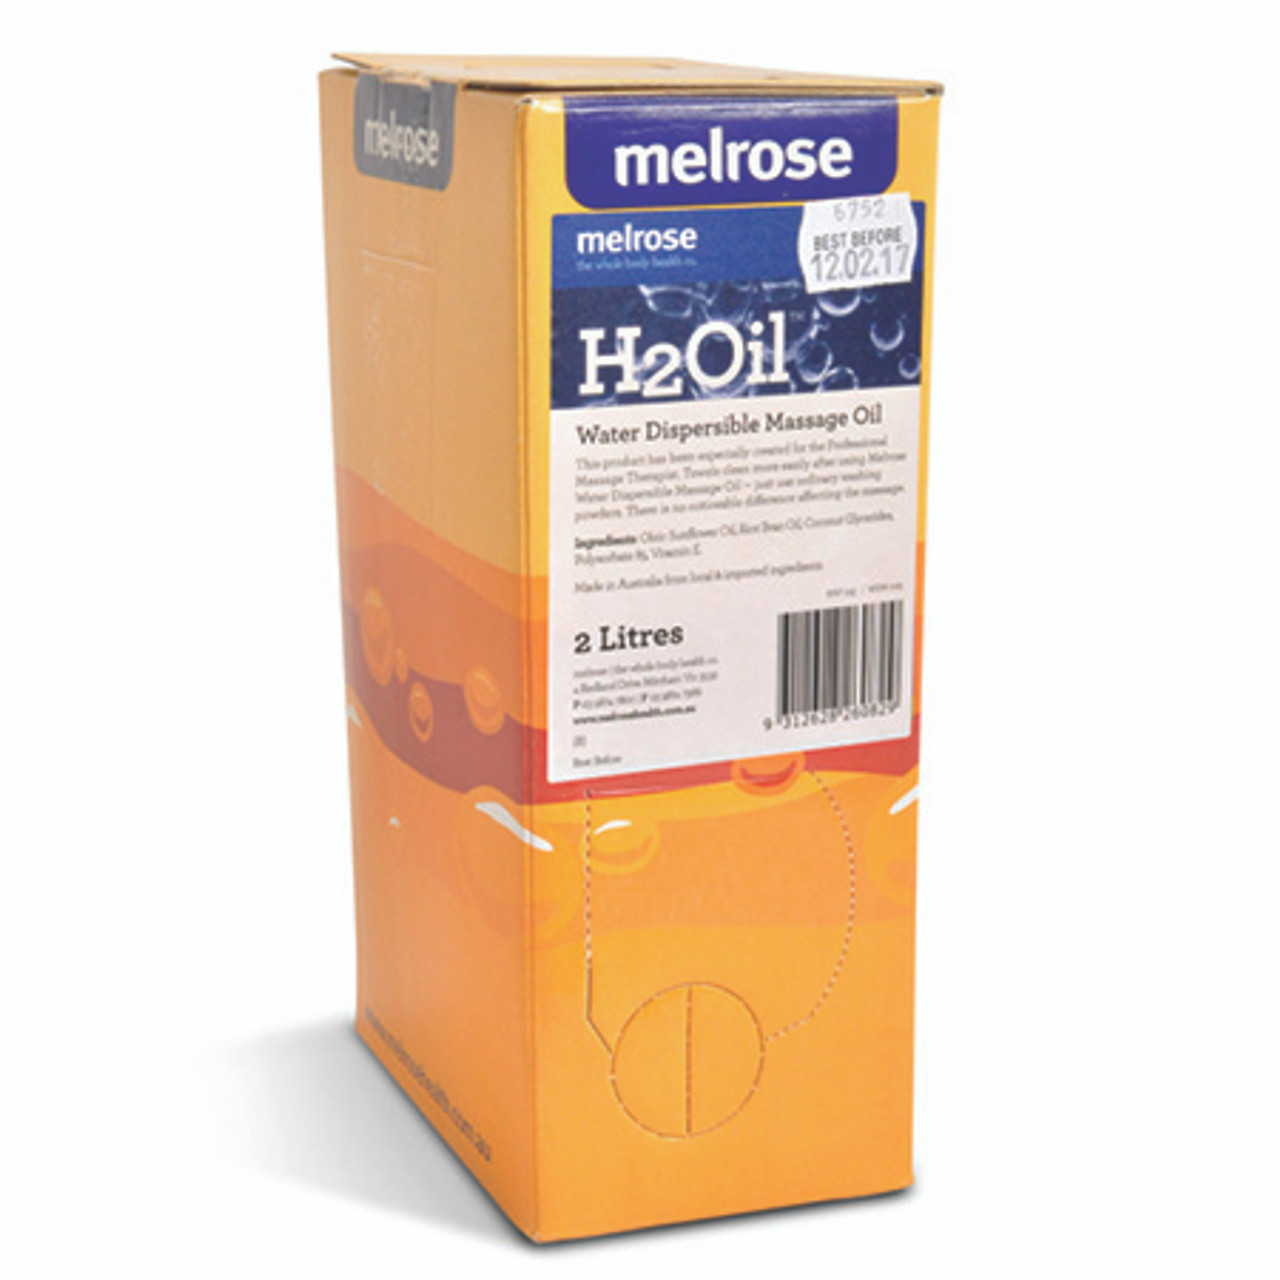 Melrose H2 Water Dispersible Oil - 2 Litre